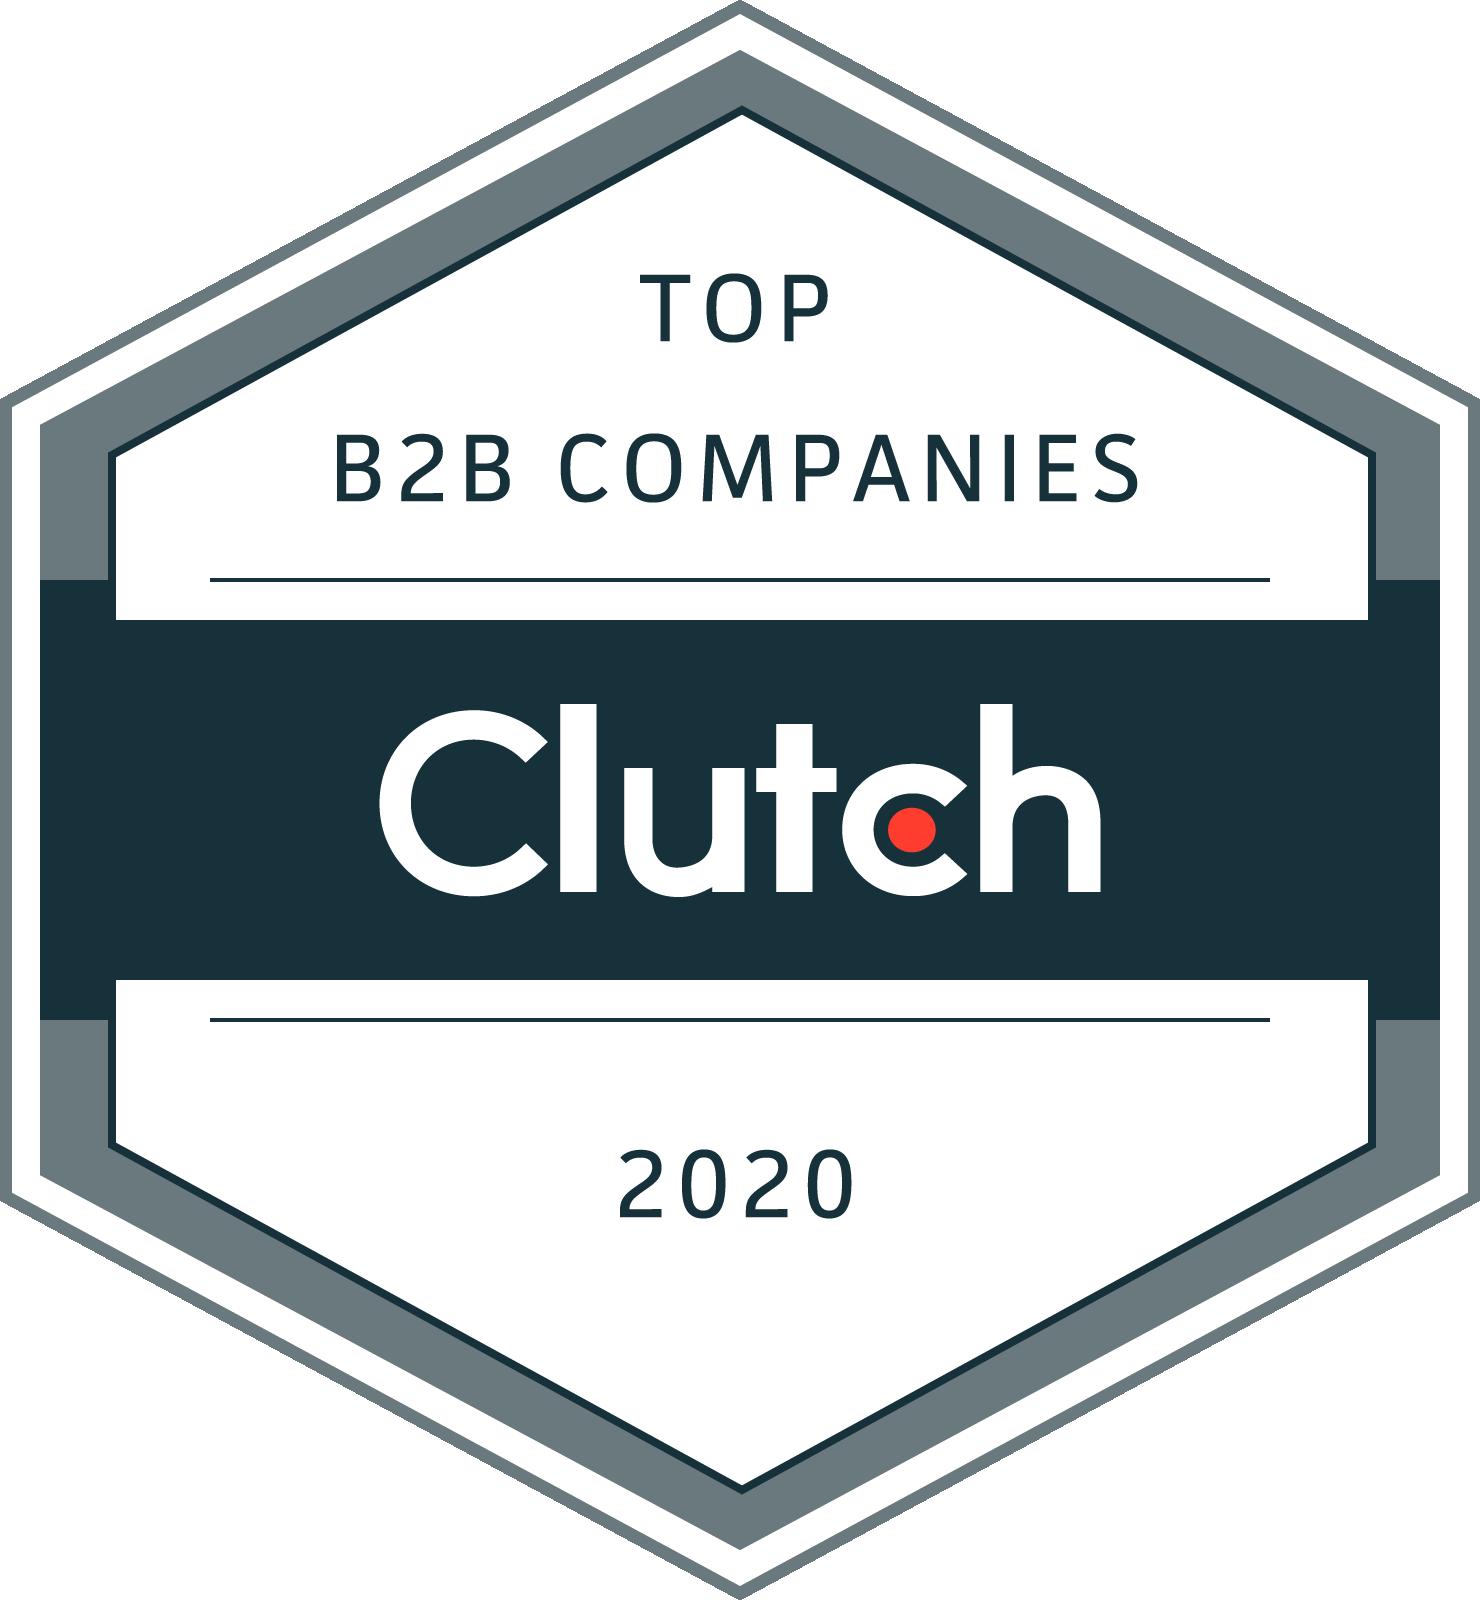 Top B2B Companies Clutch 2020